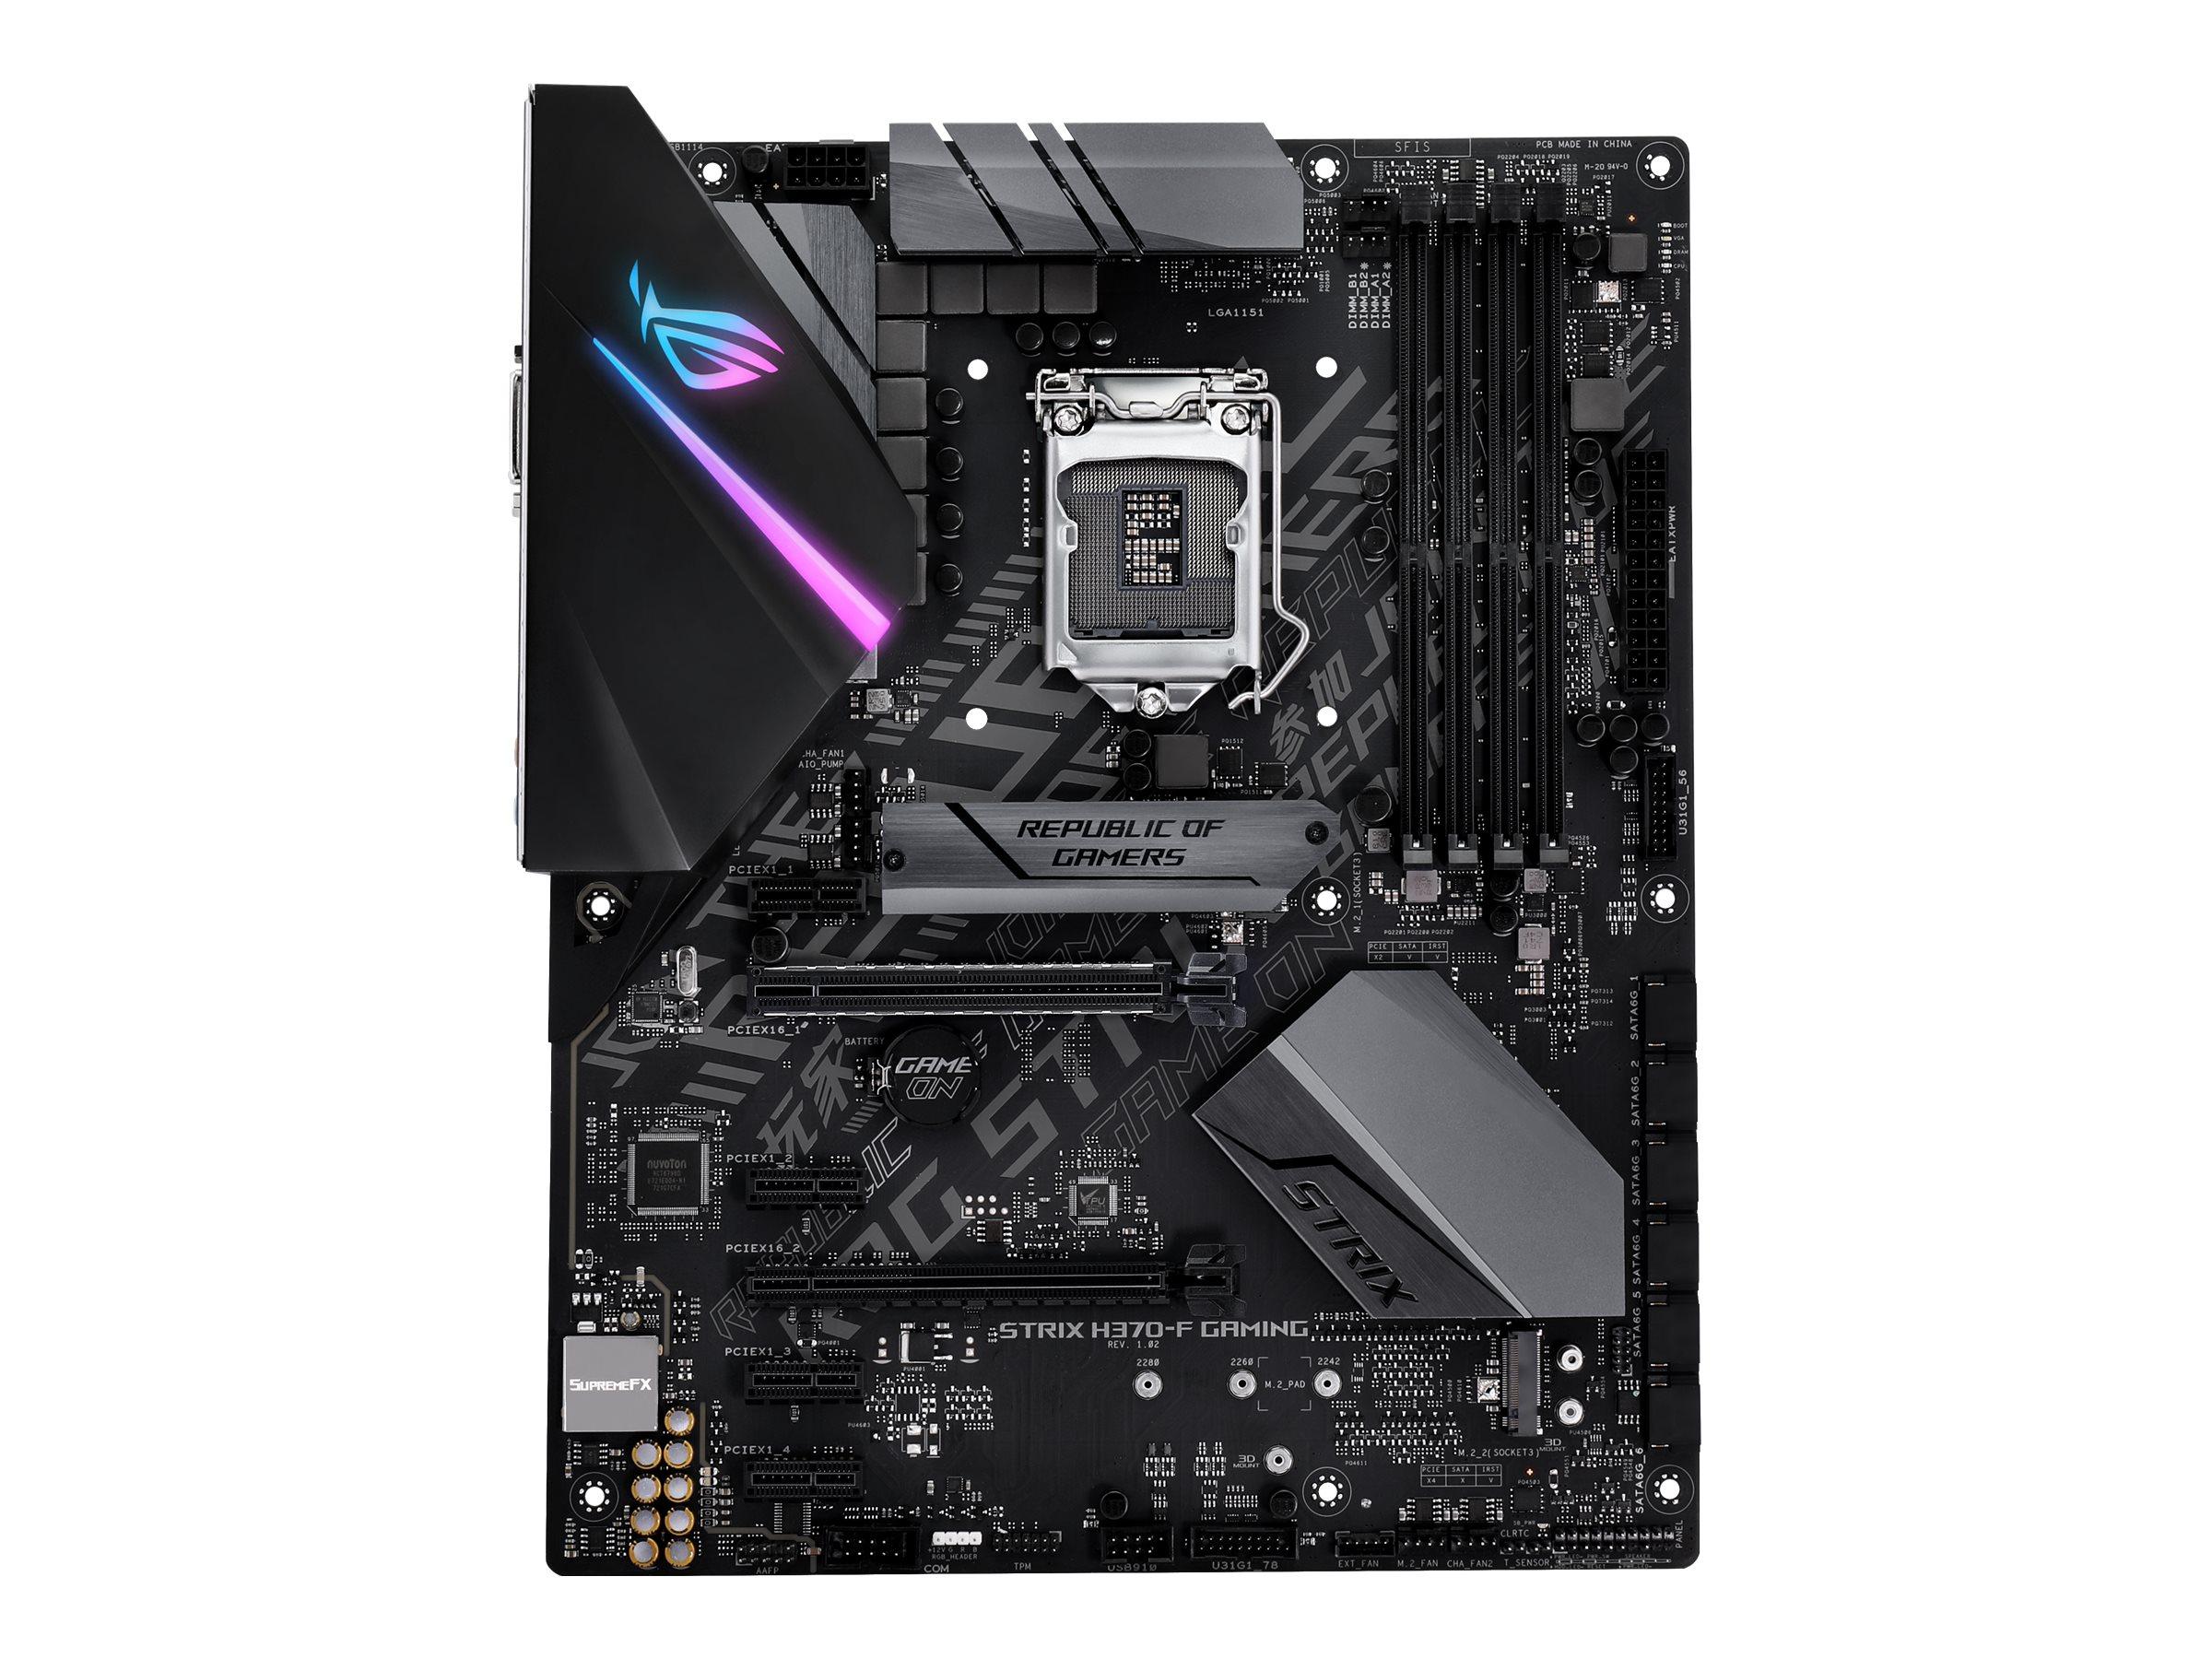 ASUS ROG STRIX H370-F GAMING - Motherboard - ATX - LGA1151 Socket - H370 - USB 3.1 Gen 1, USB-C Gen2, USB 3.1 Gen 2